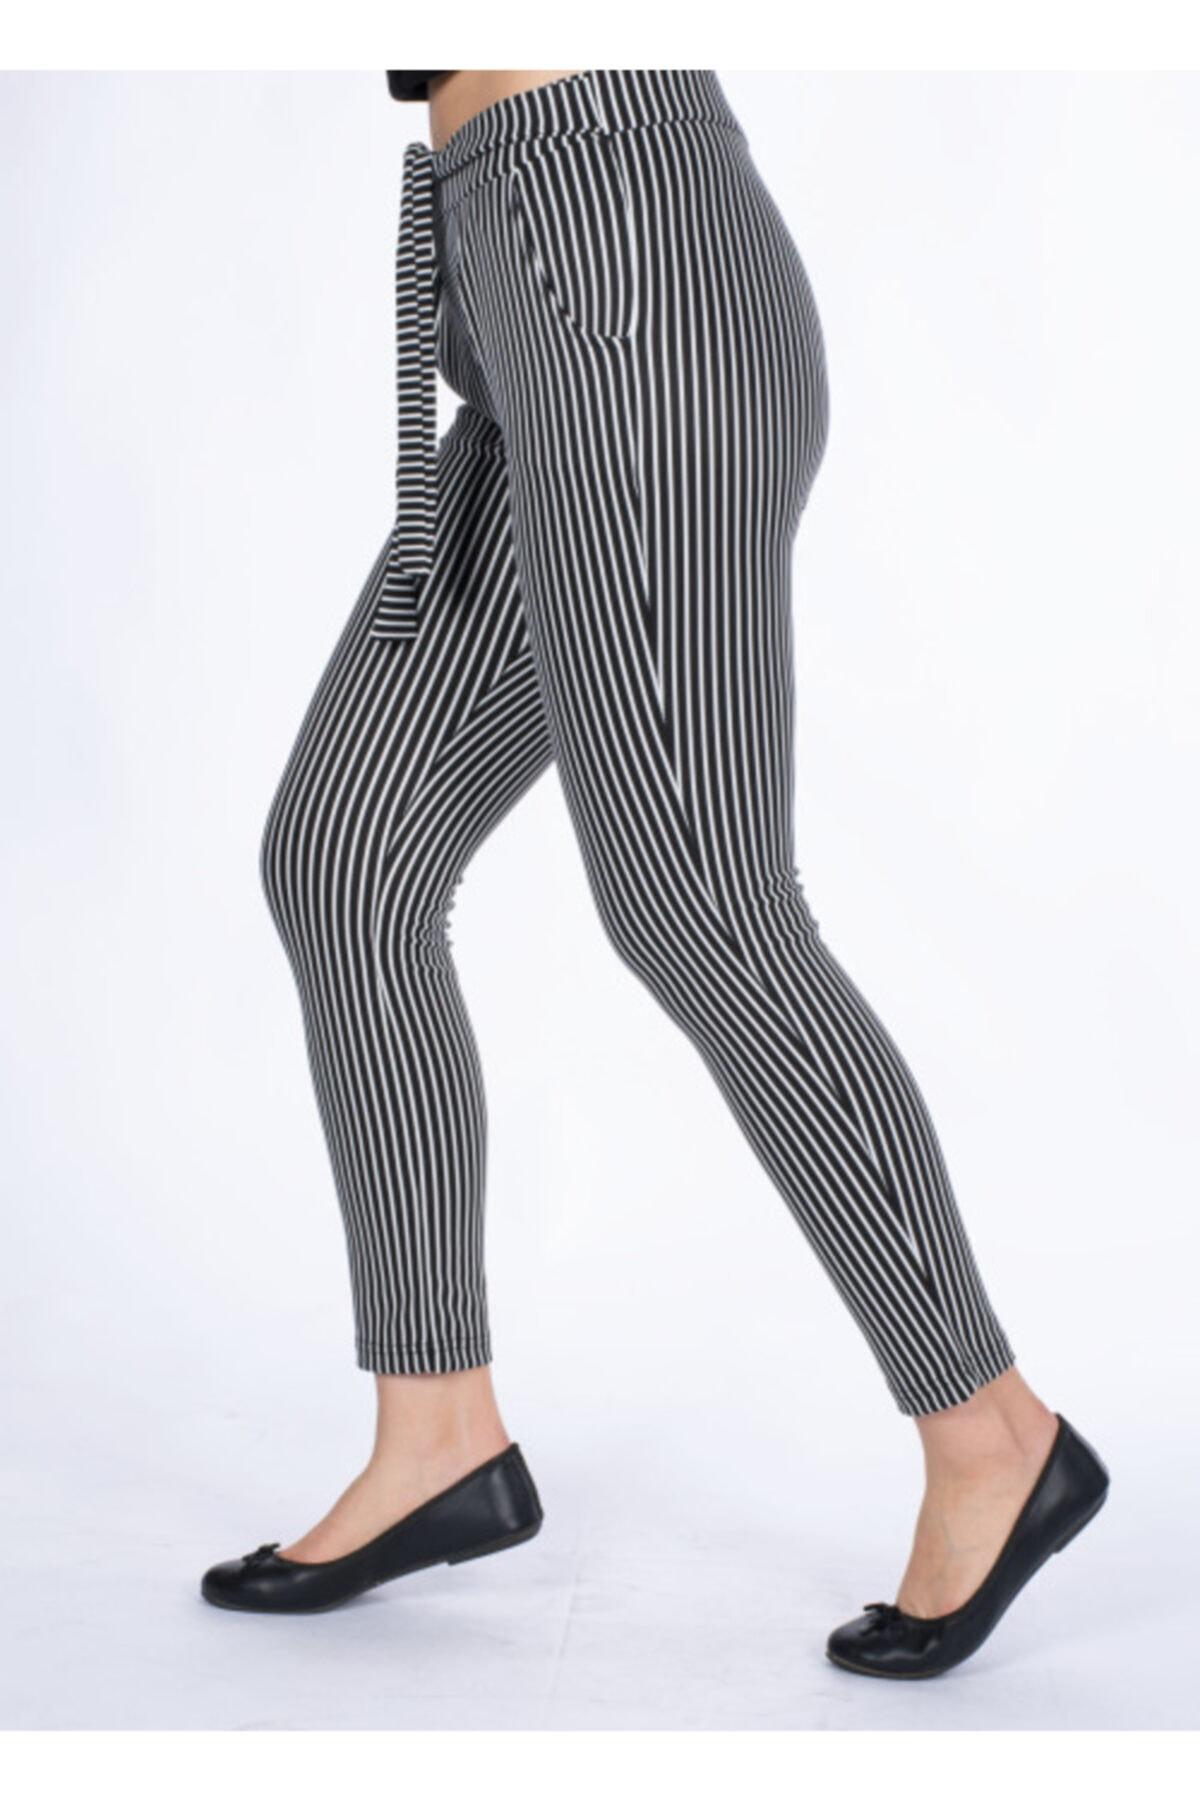 Vision Kadın Çizgili Pantolon 2